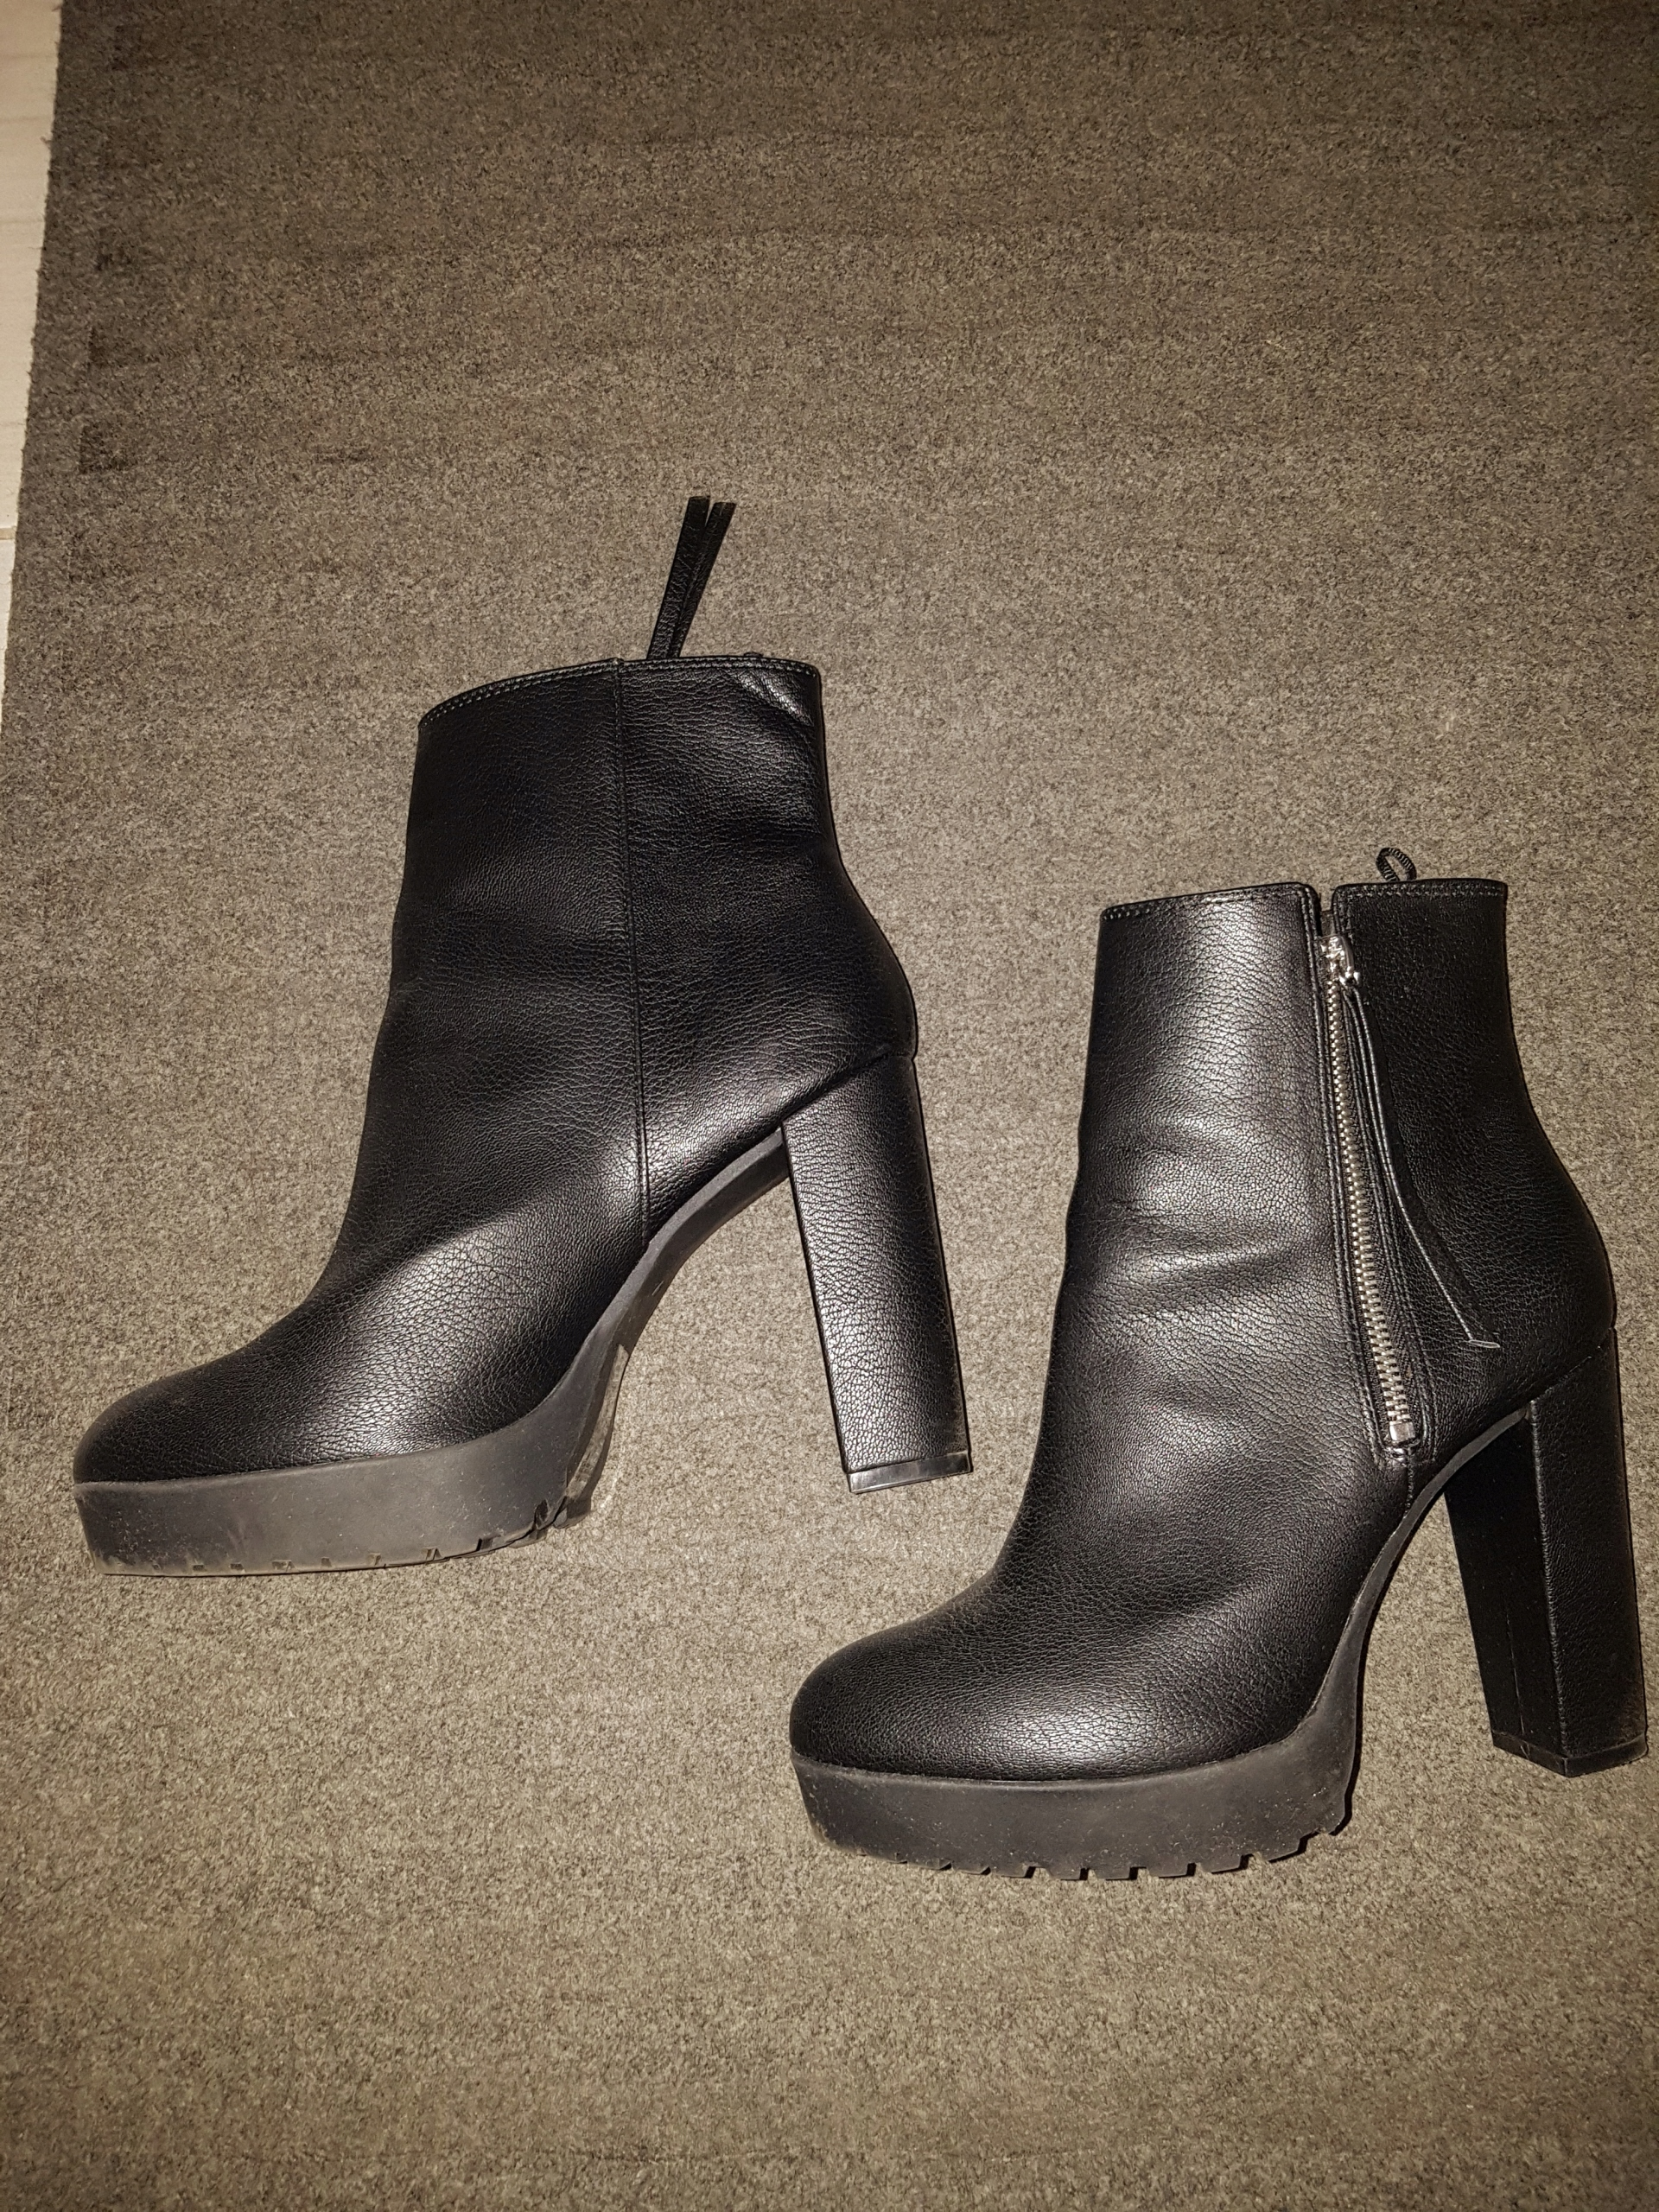 57f024e5fea6d H&M- czarne botki na słupku- idealne na wiosnę - 7888001425 ...